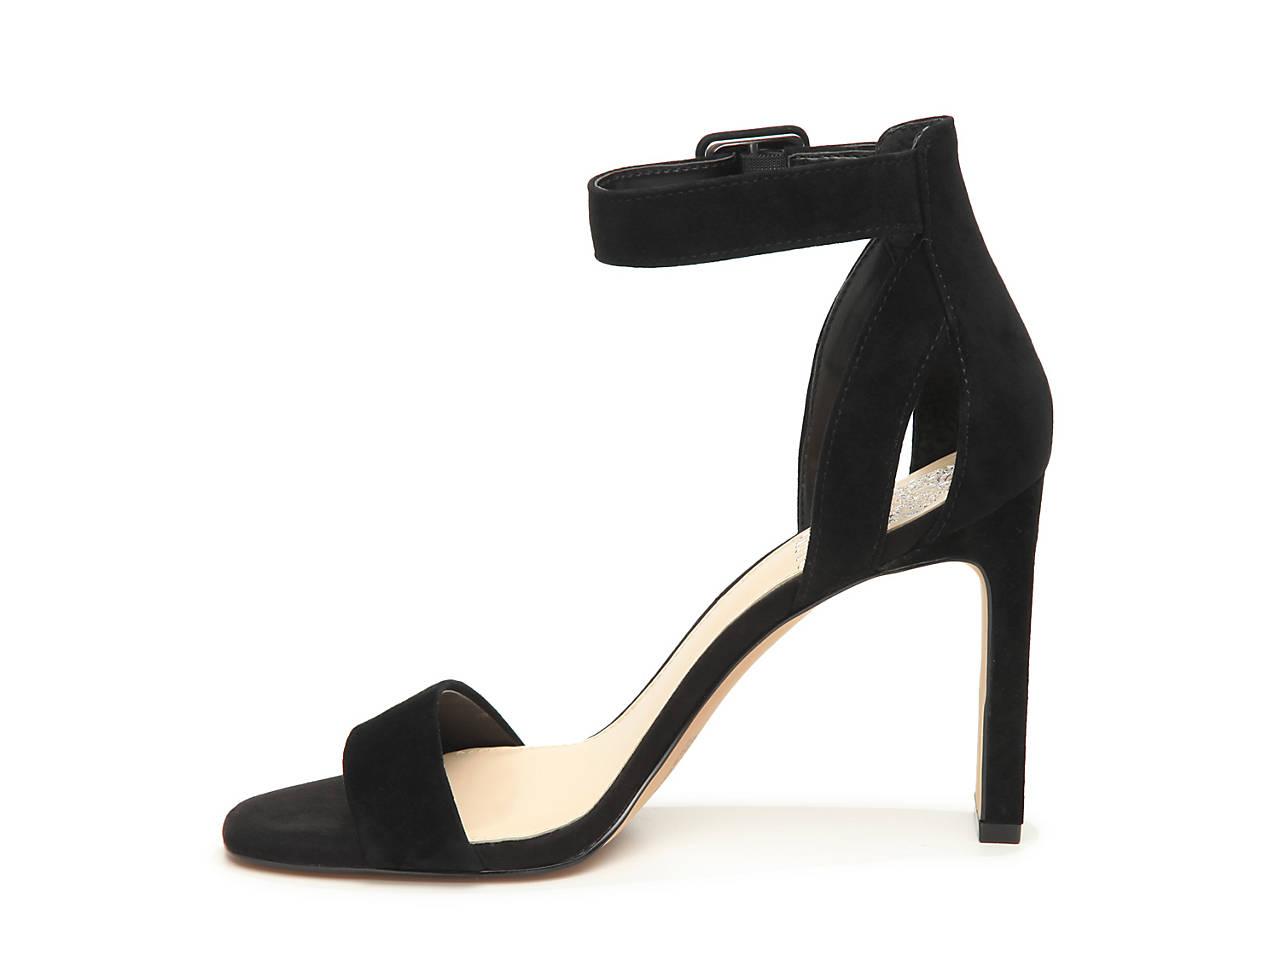 e4e69fc8f76 Vince Camuto Bevveyn Sandal Women s Shoes